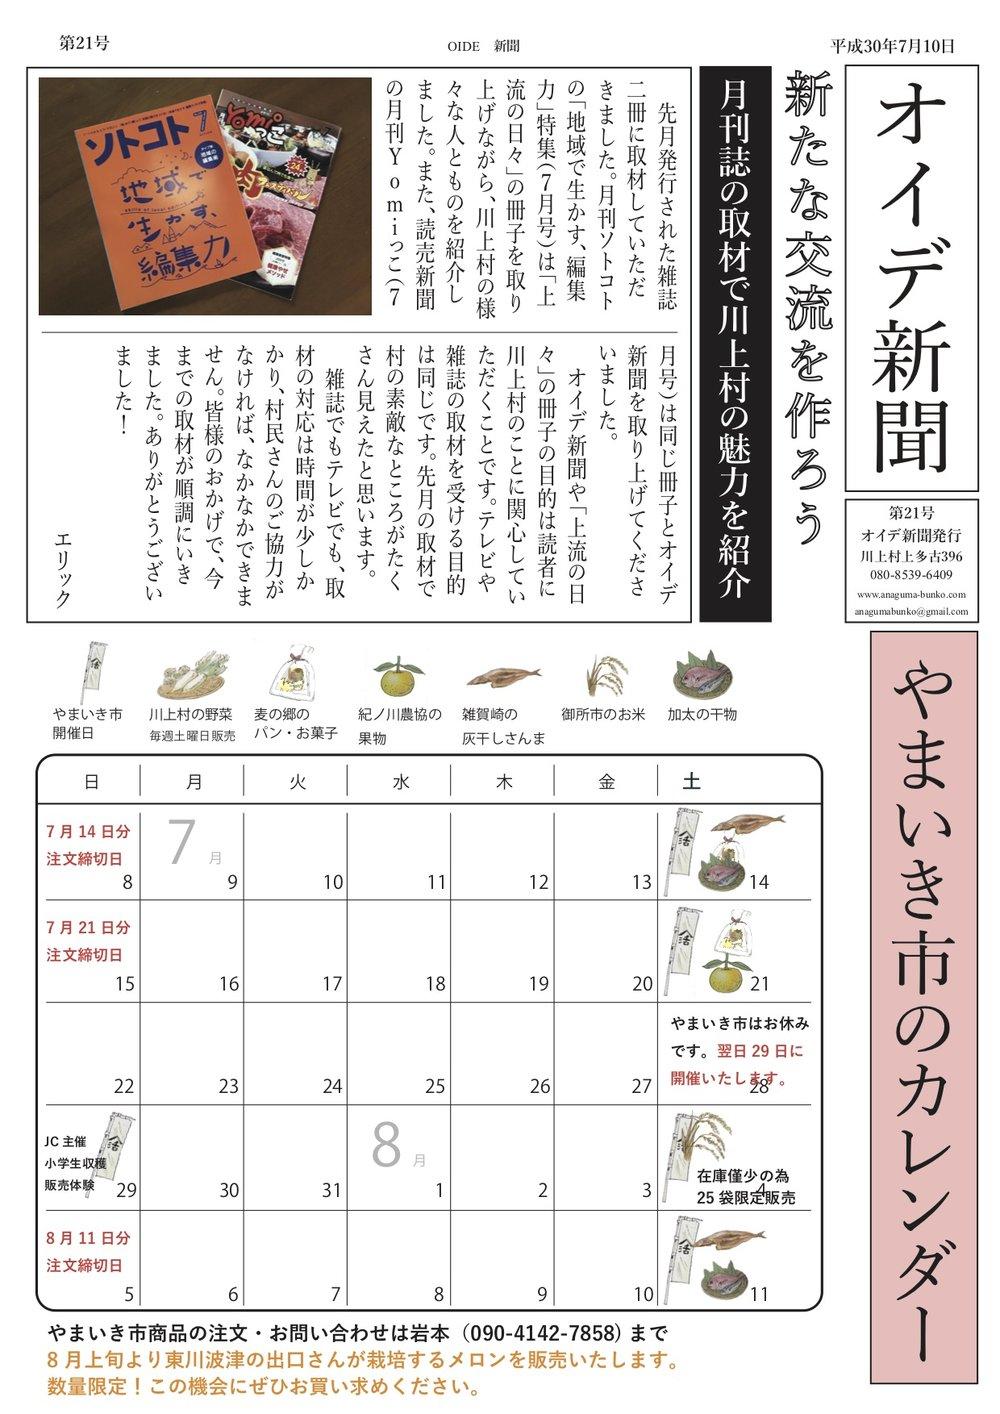 oide新聞30年7月号表.jpg